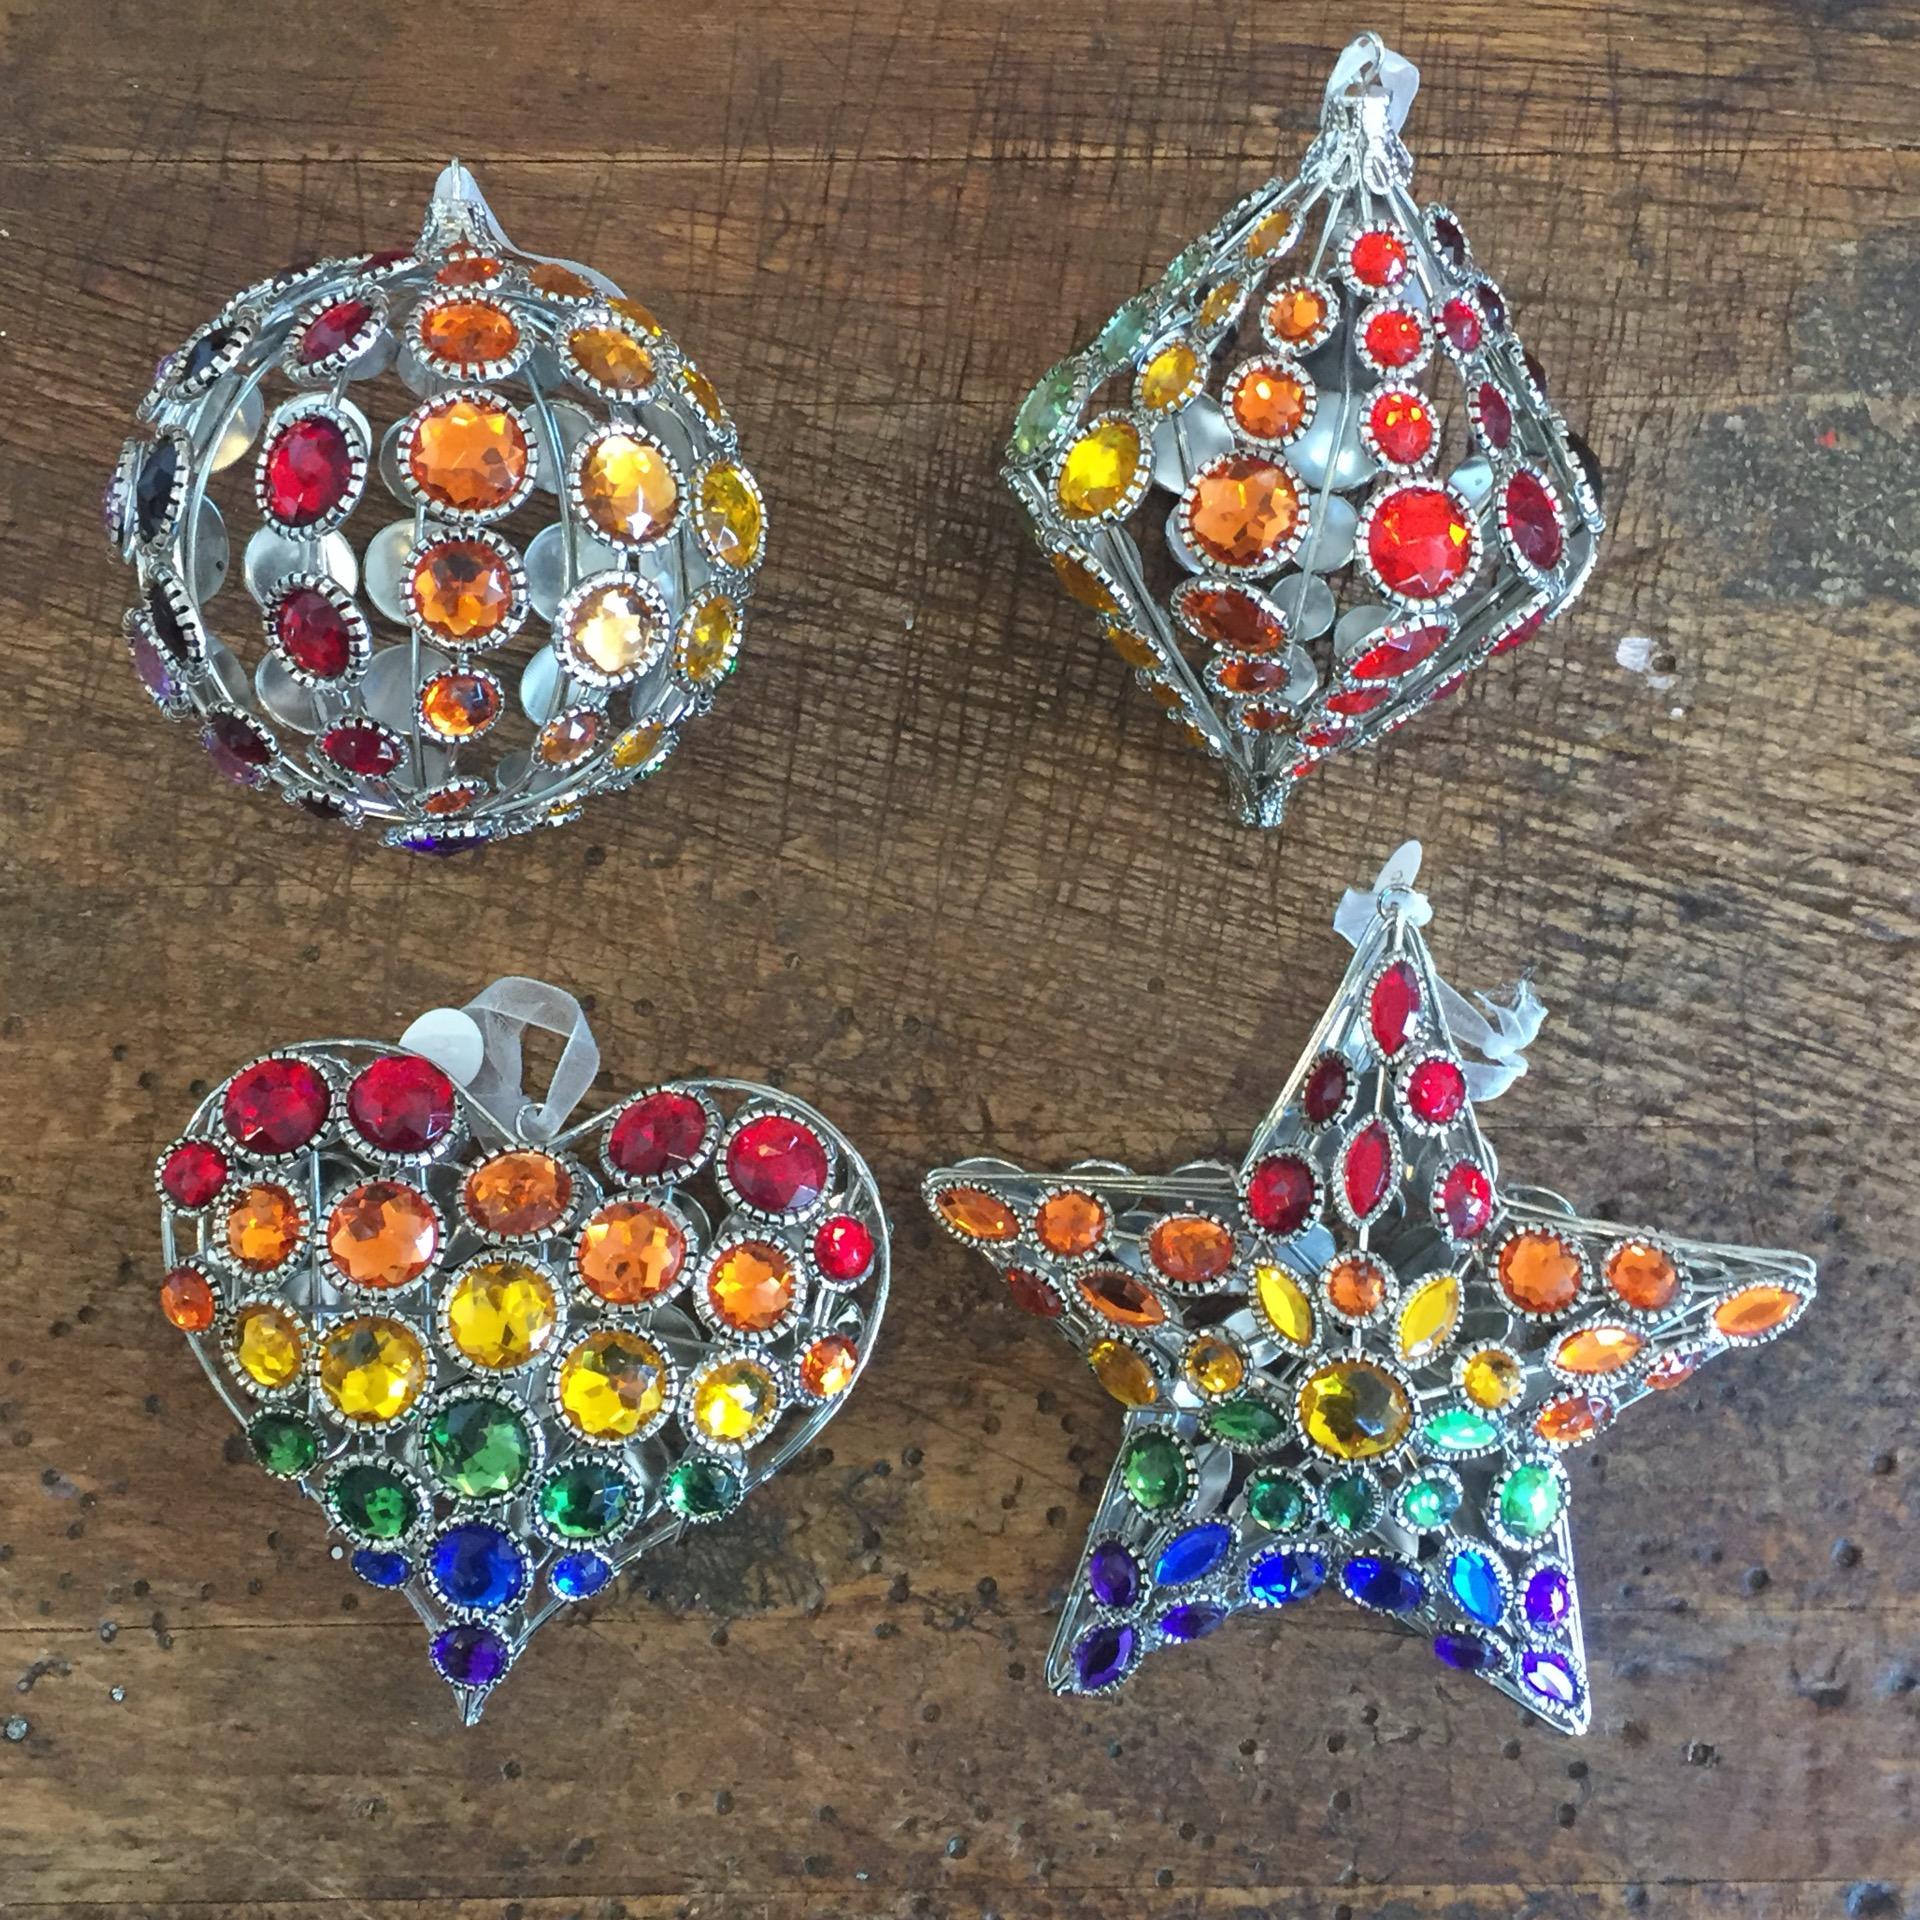 Jeweled Ornament (Heart, Star, Diamond, Circle)